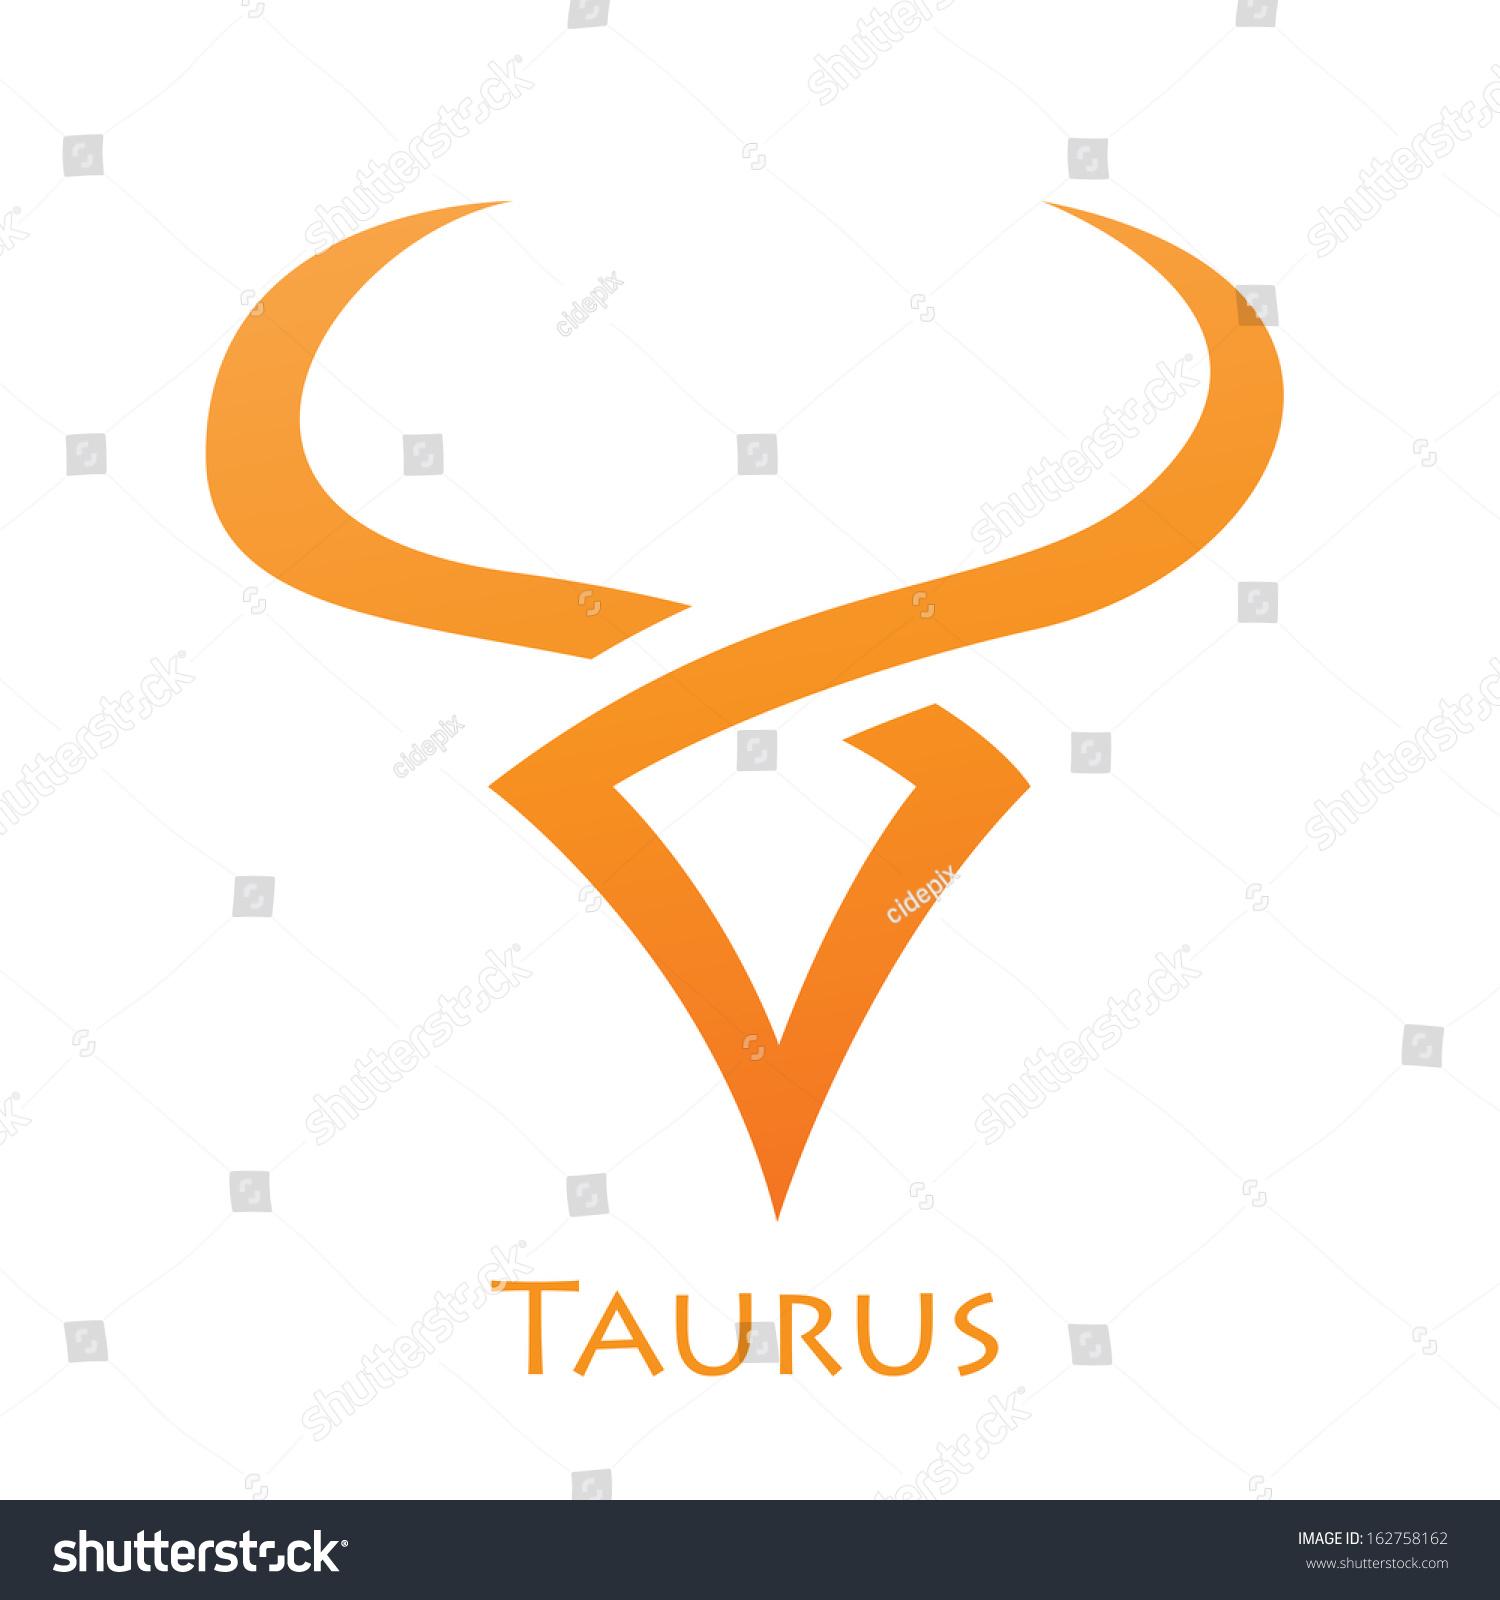 Illustration Simplistic Lines Taurus Zodiac Star Stock ...